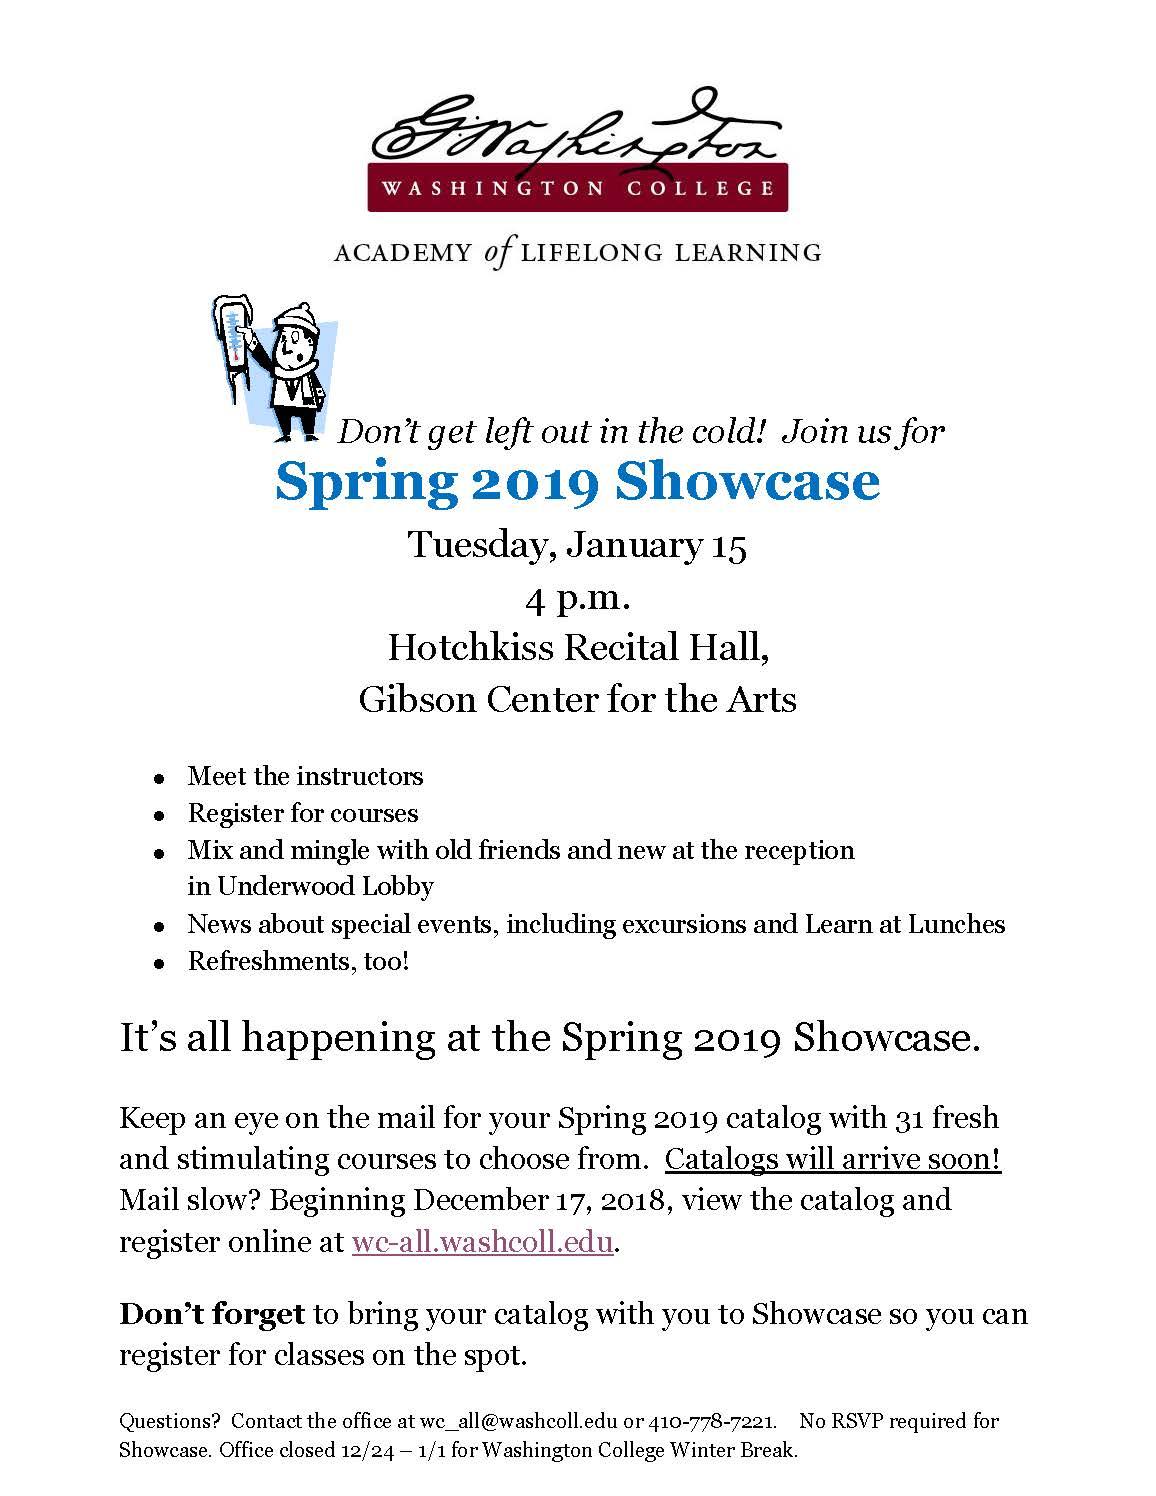 WC-ALL Spring Showcase